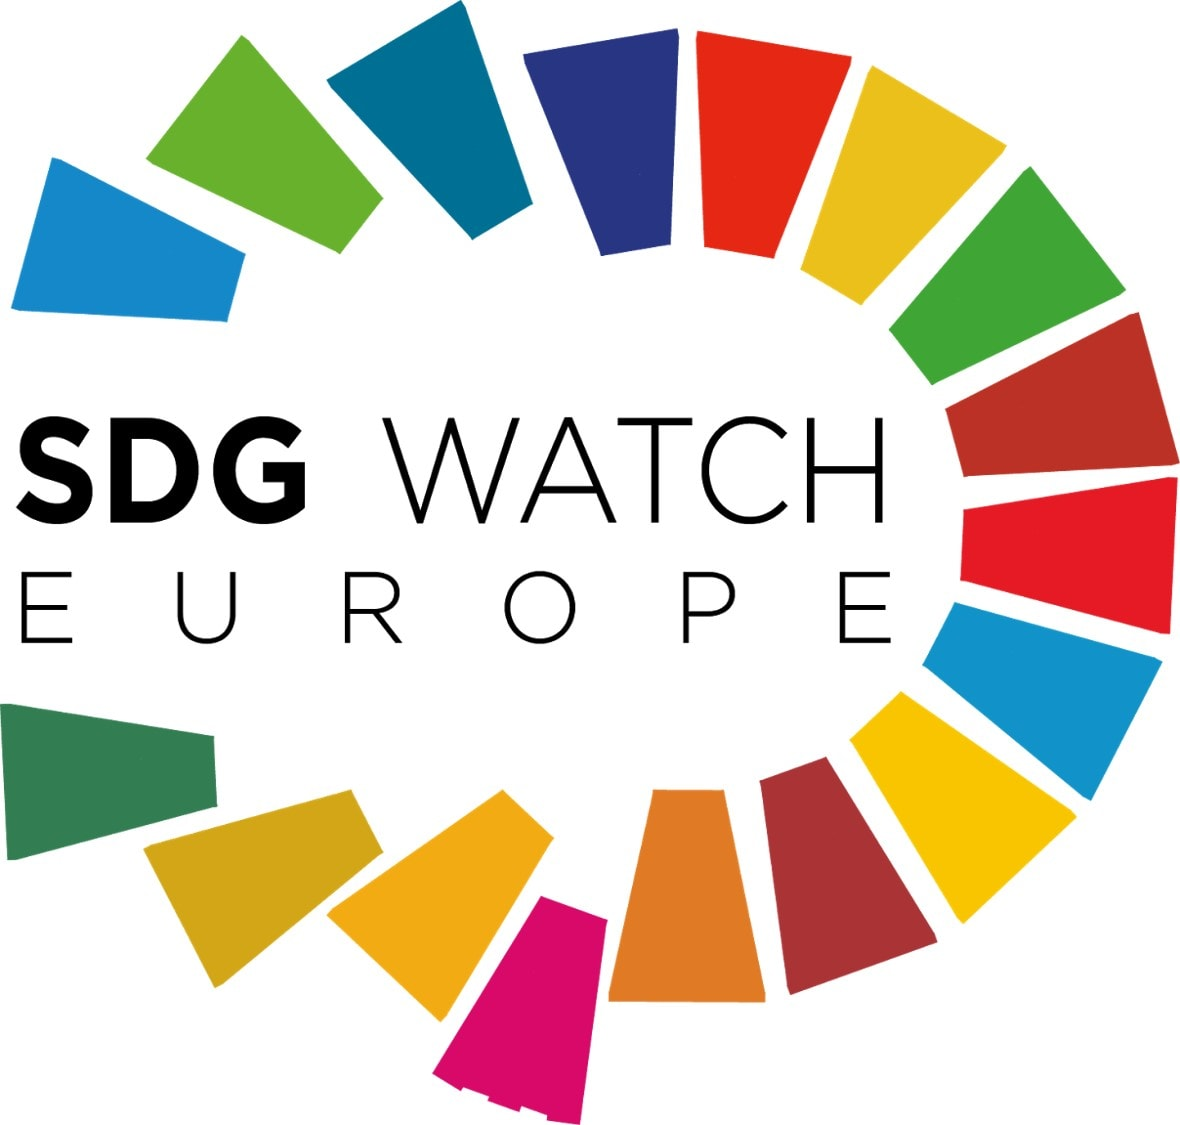 SLOGA na plenarnem zasedanju koalicije SDG Watch Europe